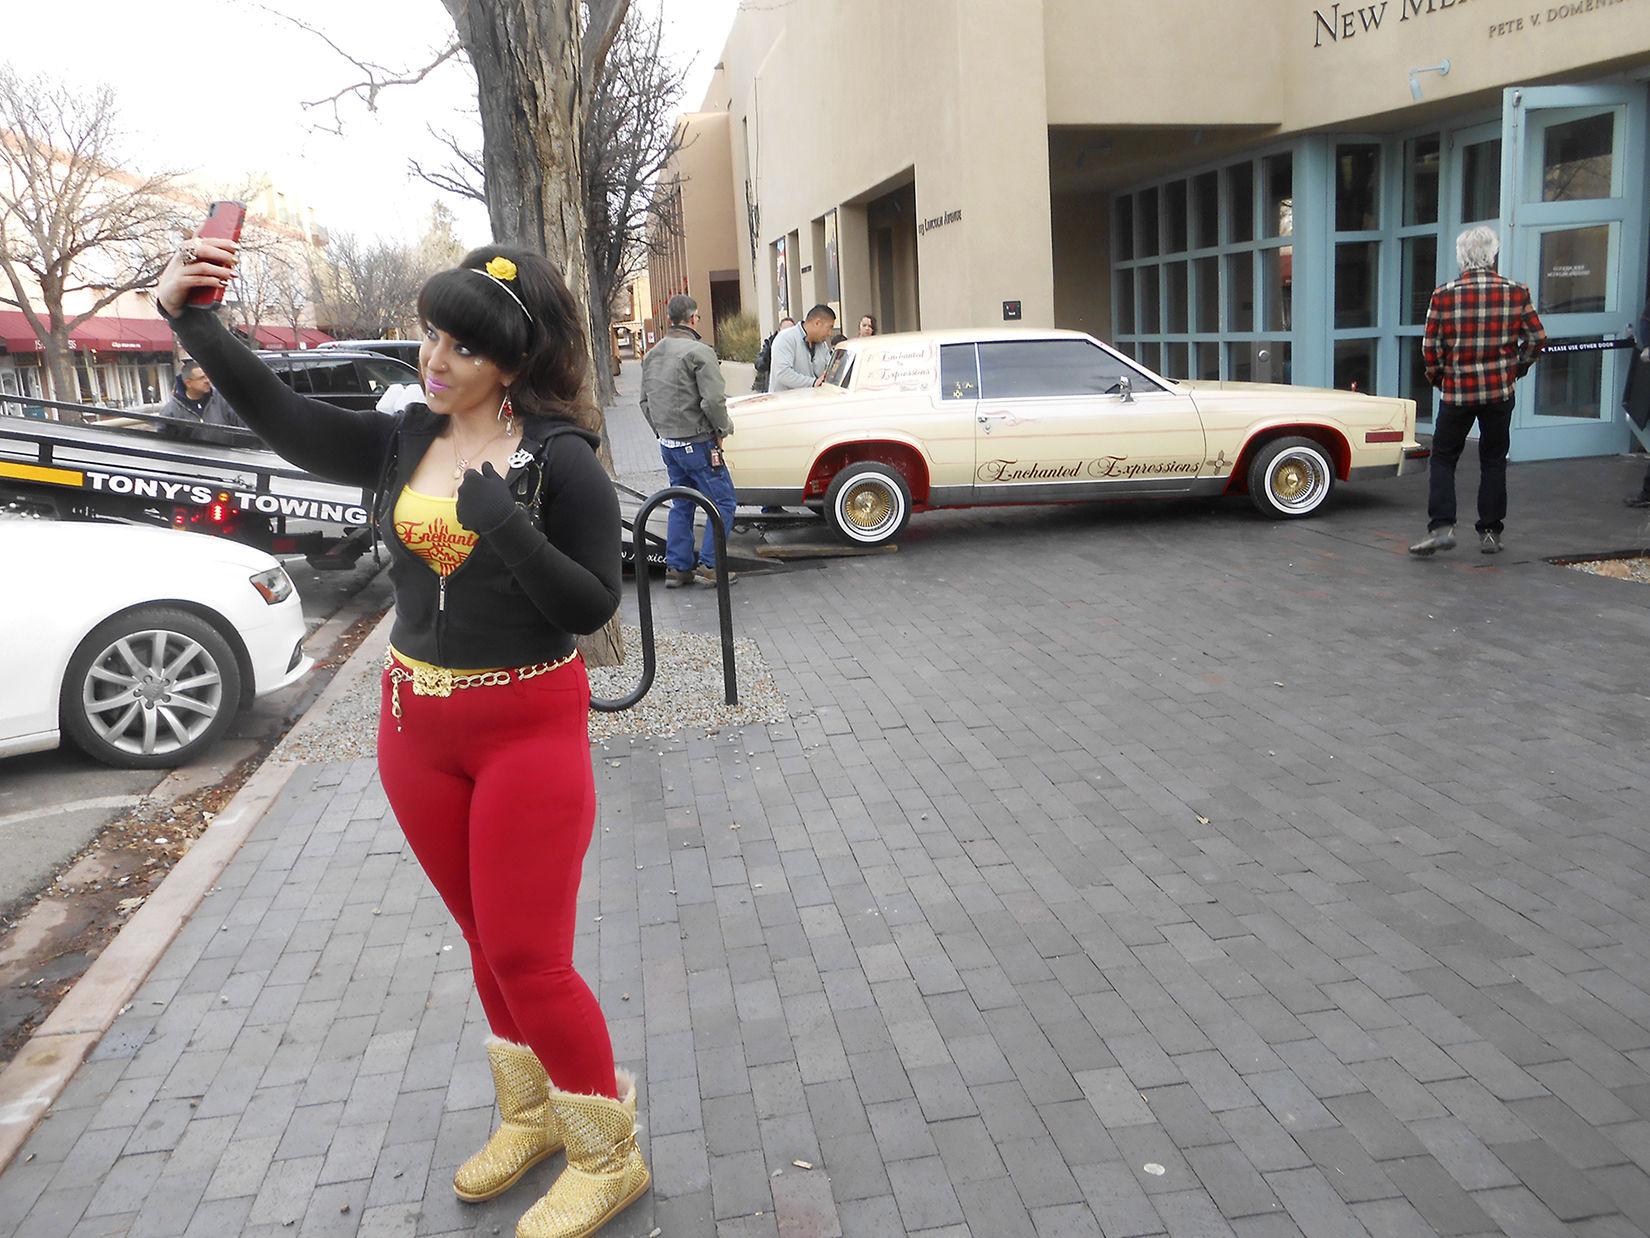 presenting miss 505 justice lovato s cadillac eldorado lowrider Blue Cadillac Lowriders Denver Colorado presenting miss 505 justice lovato s cadillac eldorado lowrider